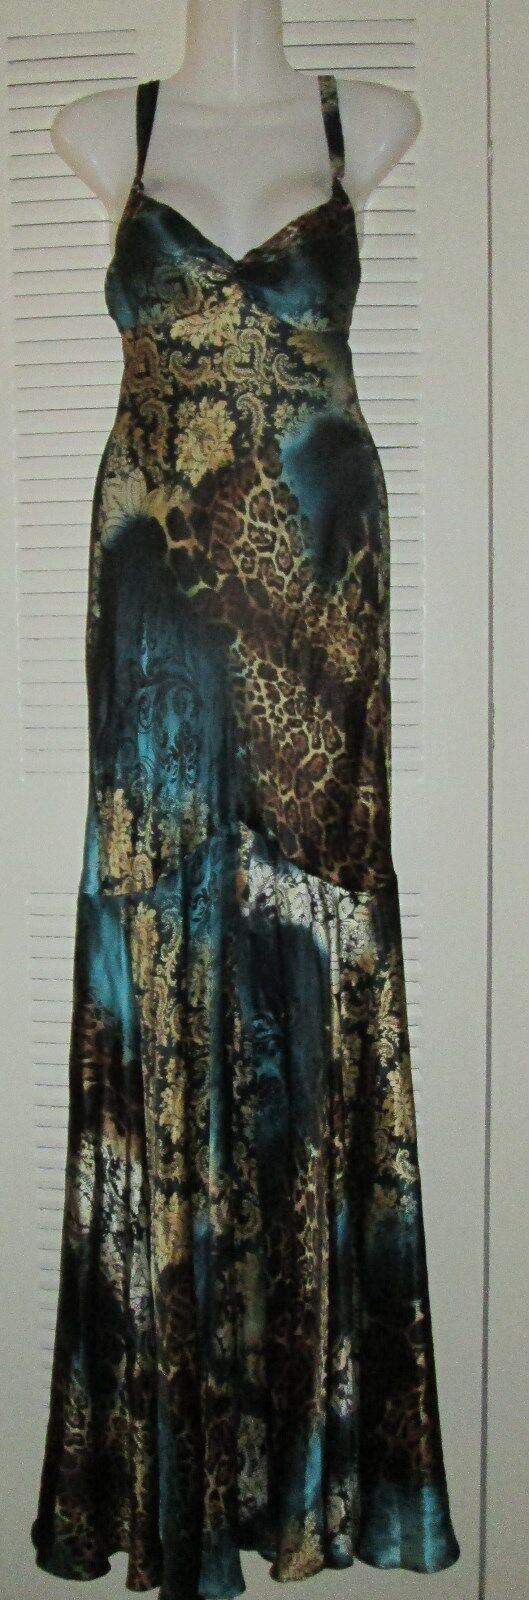 390 FABulous Mary L Couture Animal Cheetah Mermaid Evening Dress NWT Sz 6 GRN